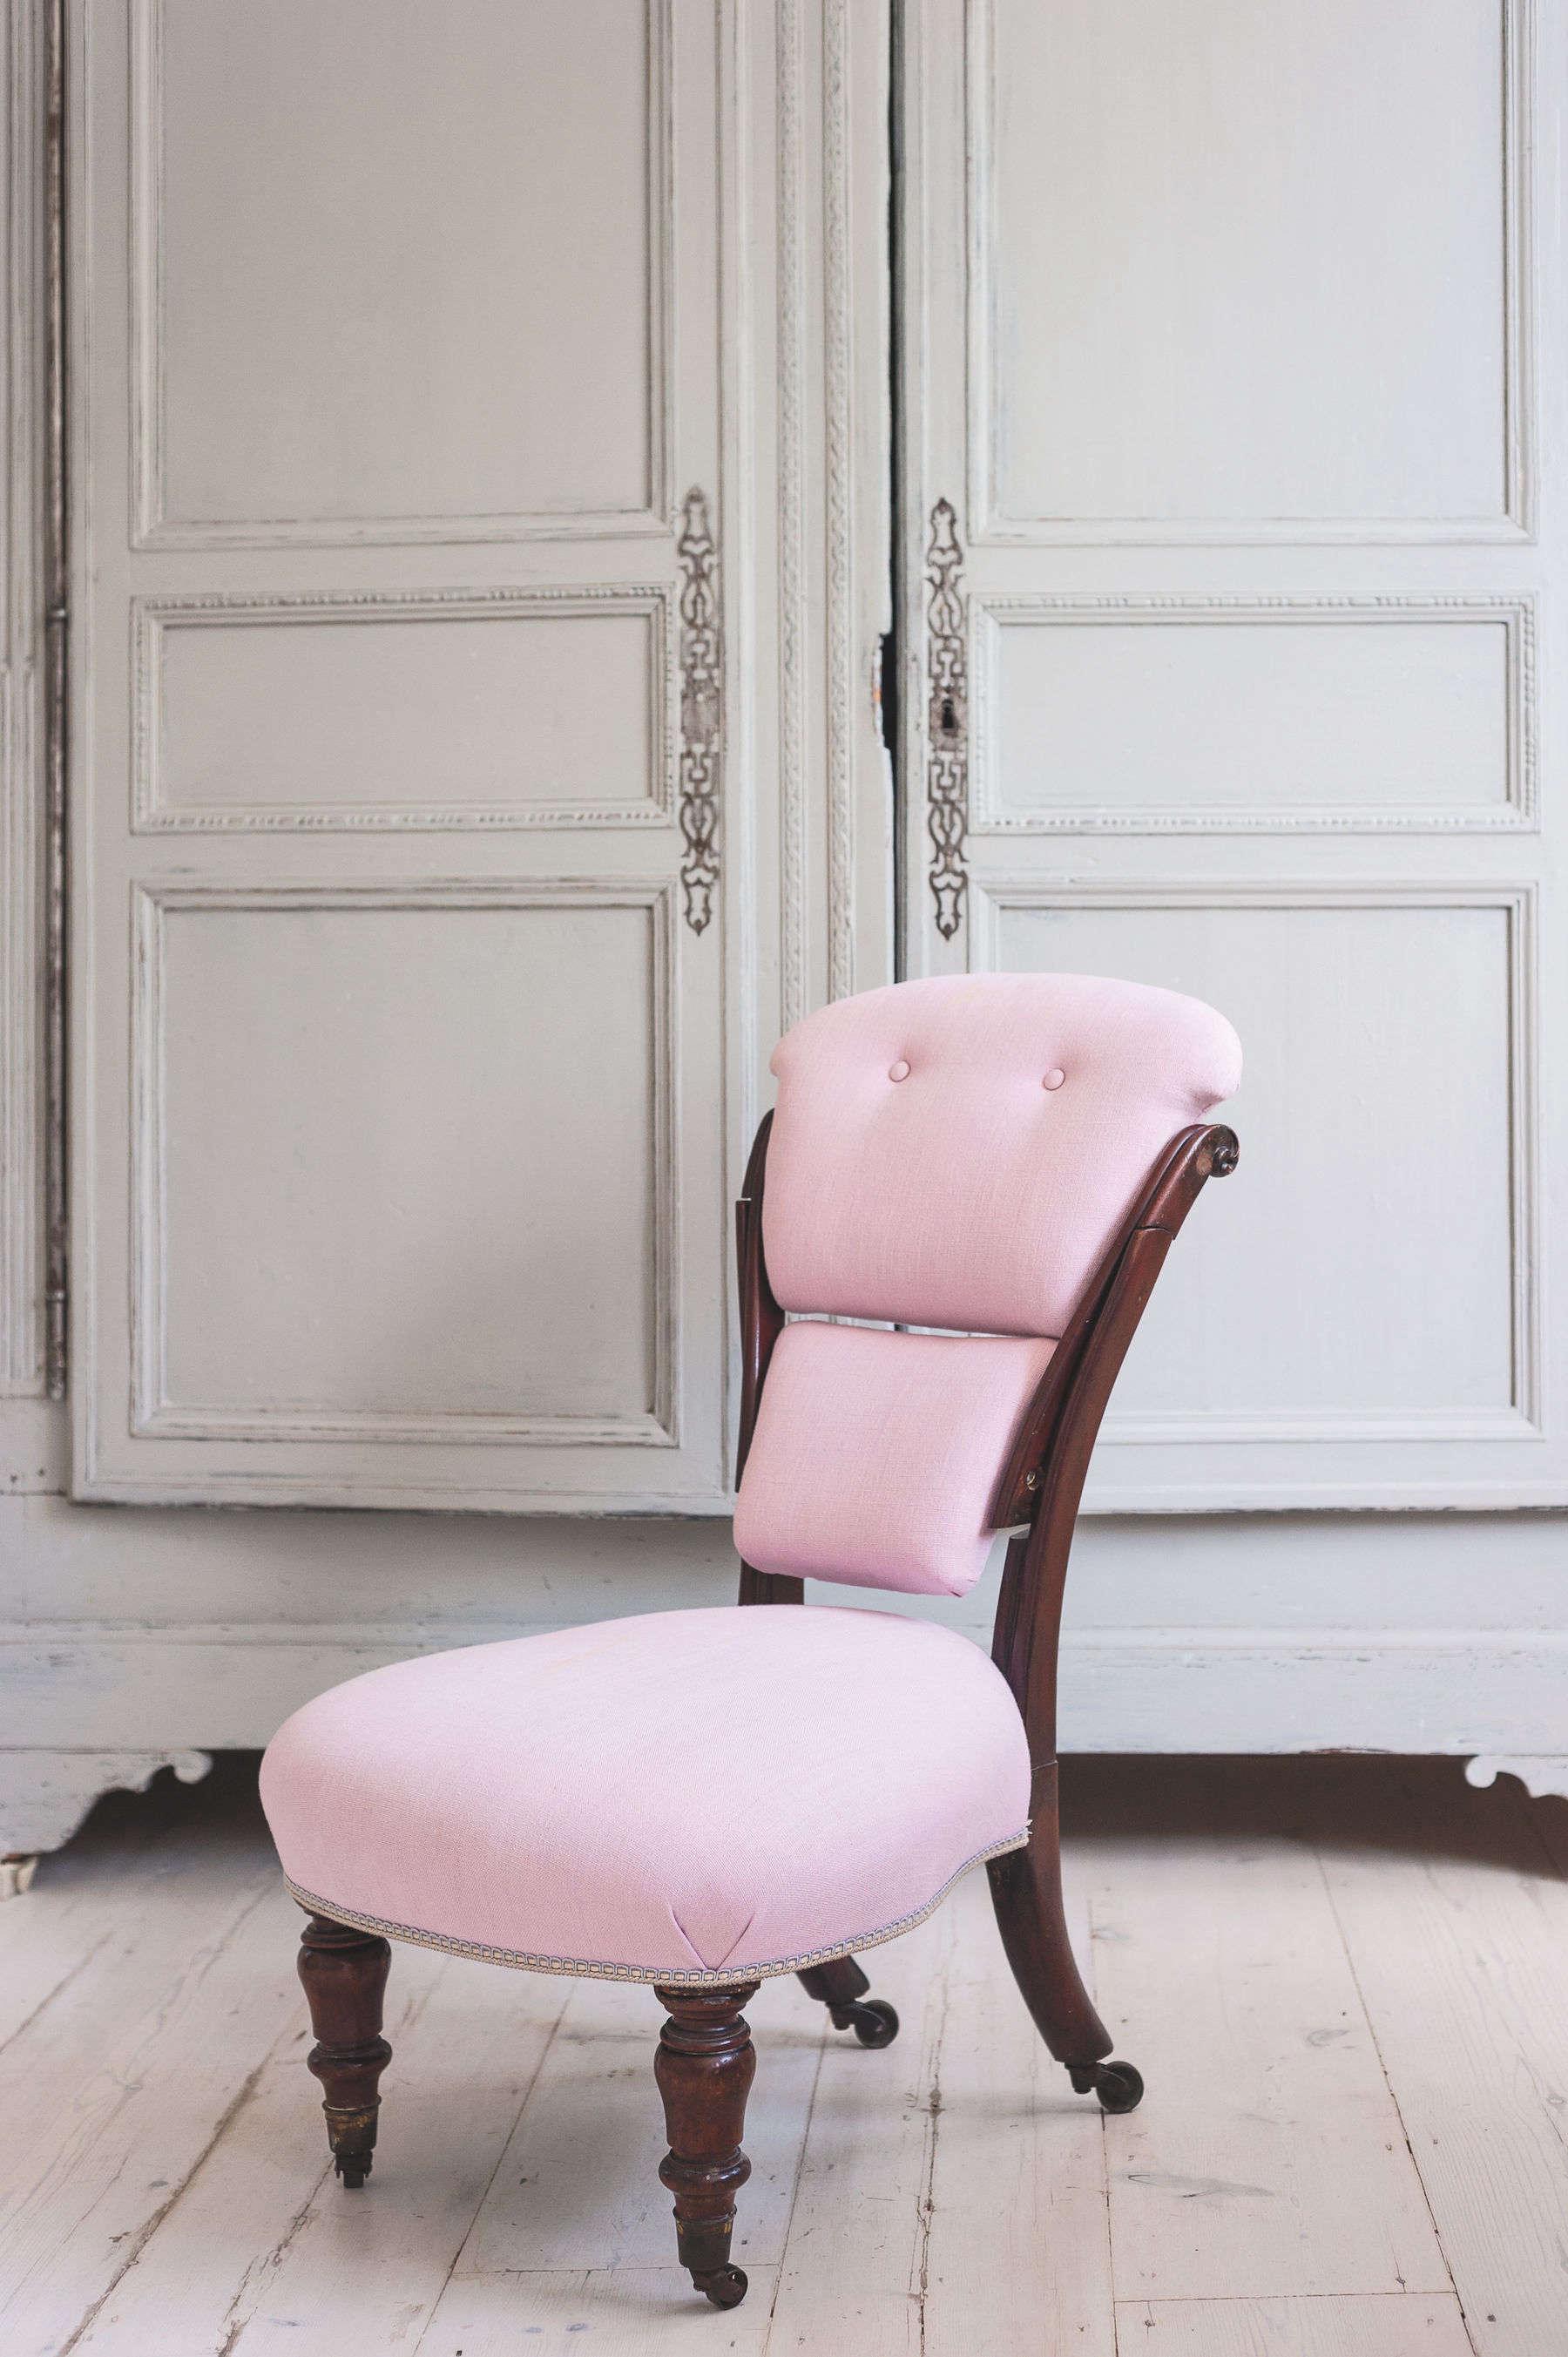 pink-upholstered-chair-michelle-mckenna-bathroom-uk